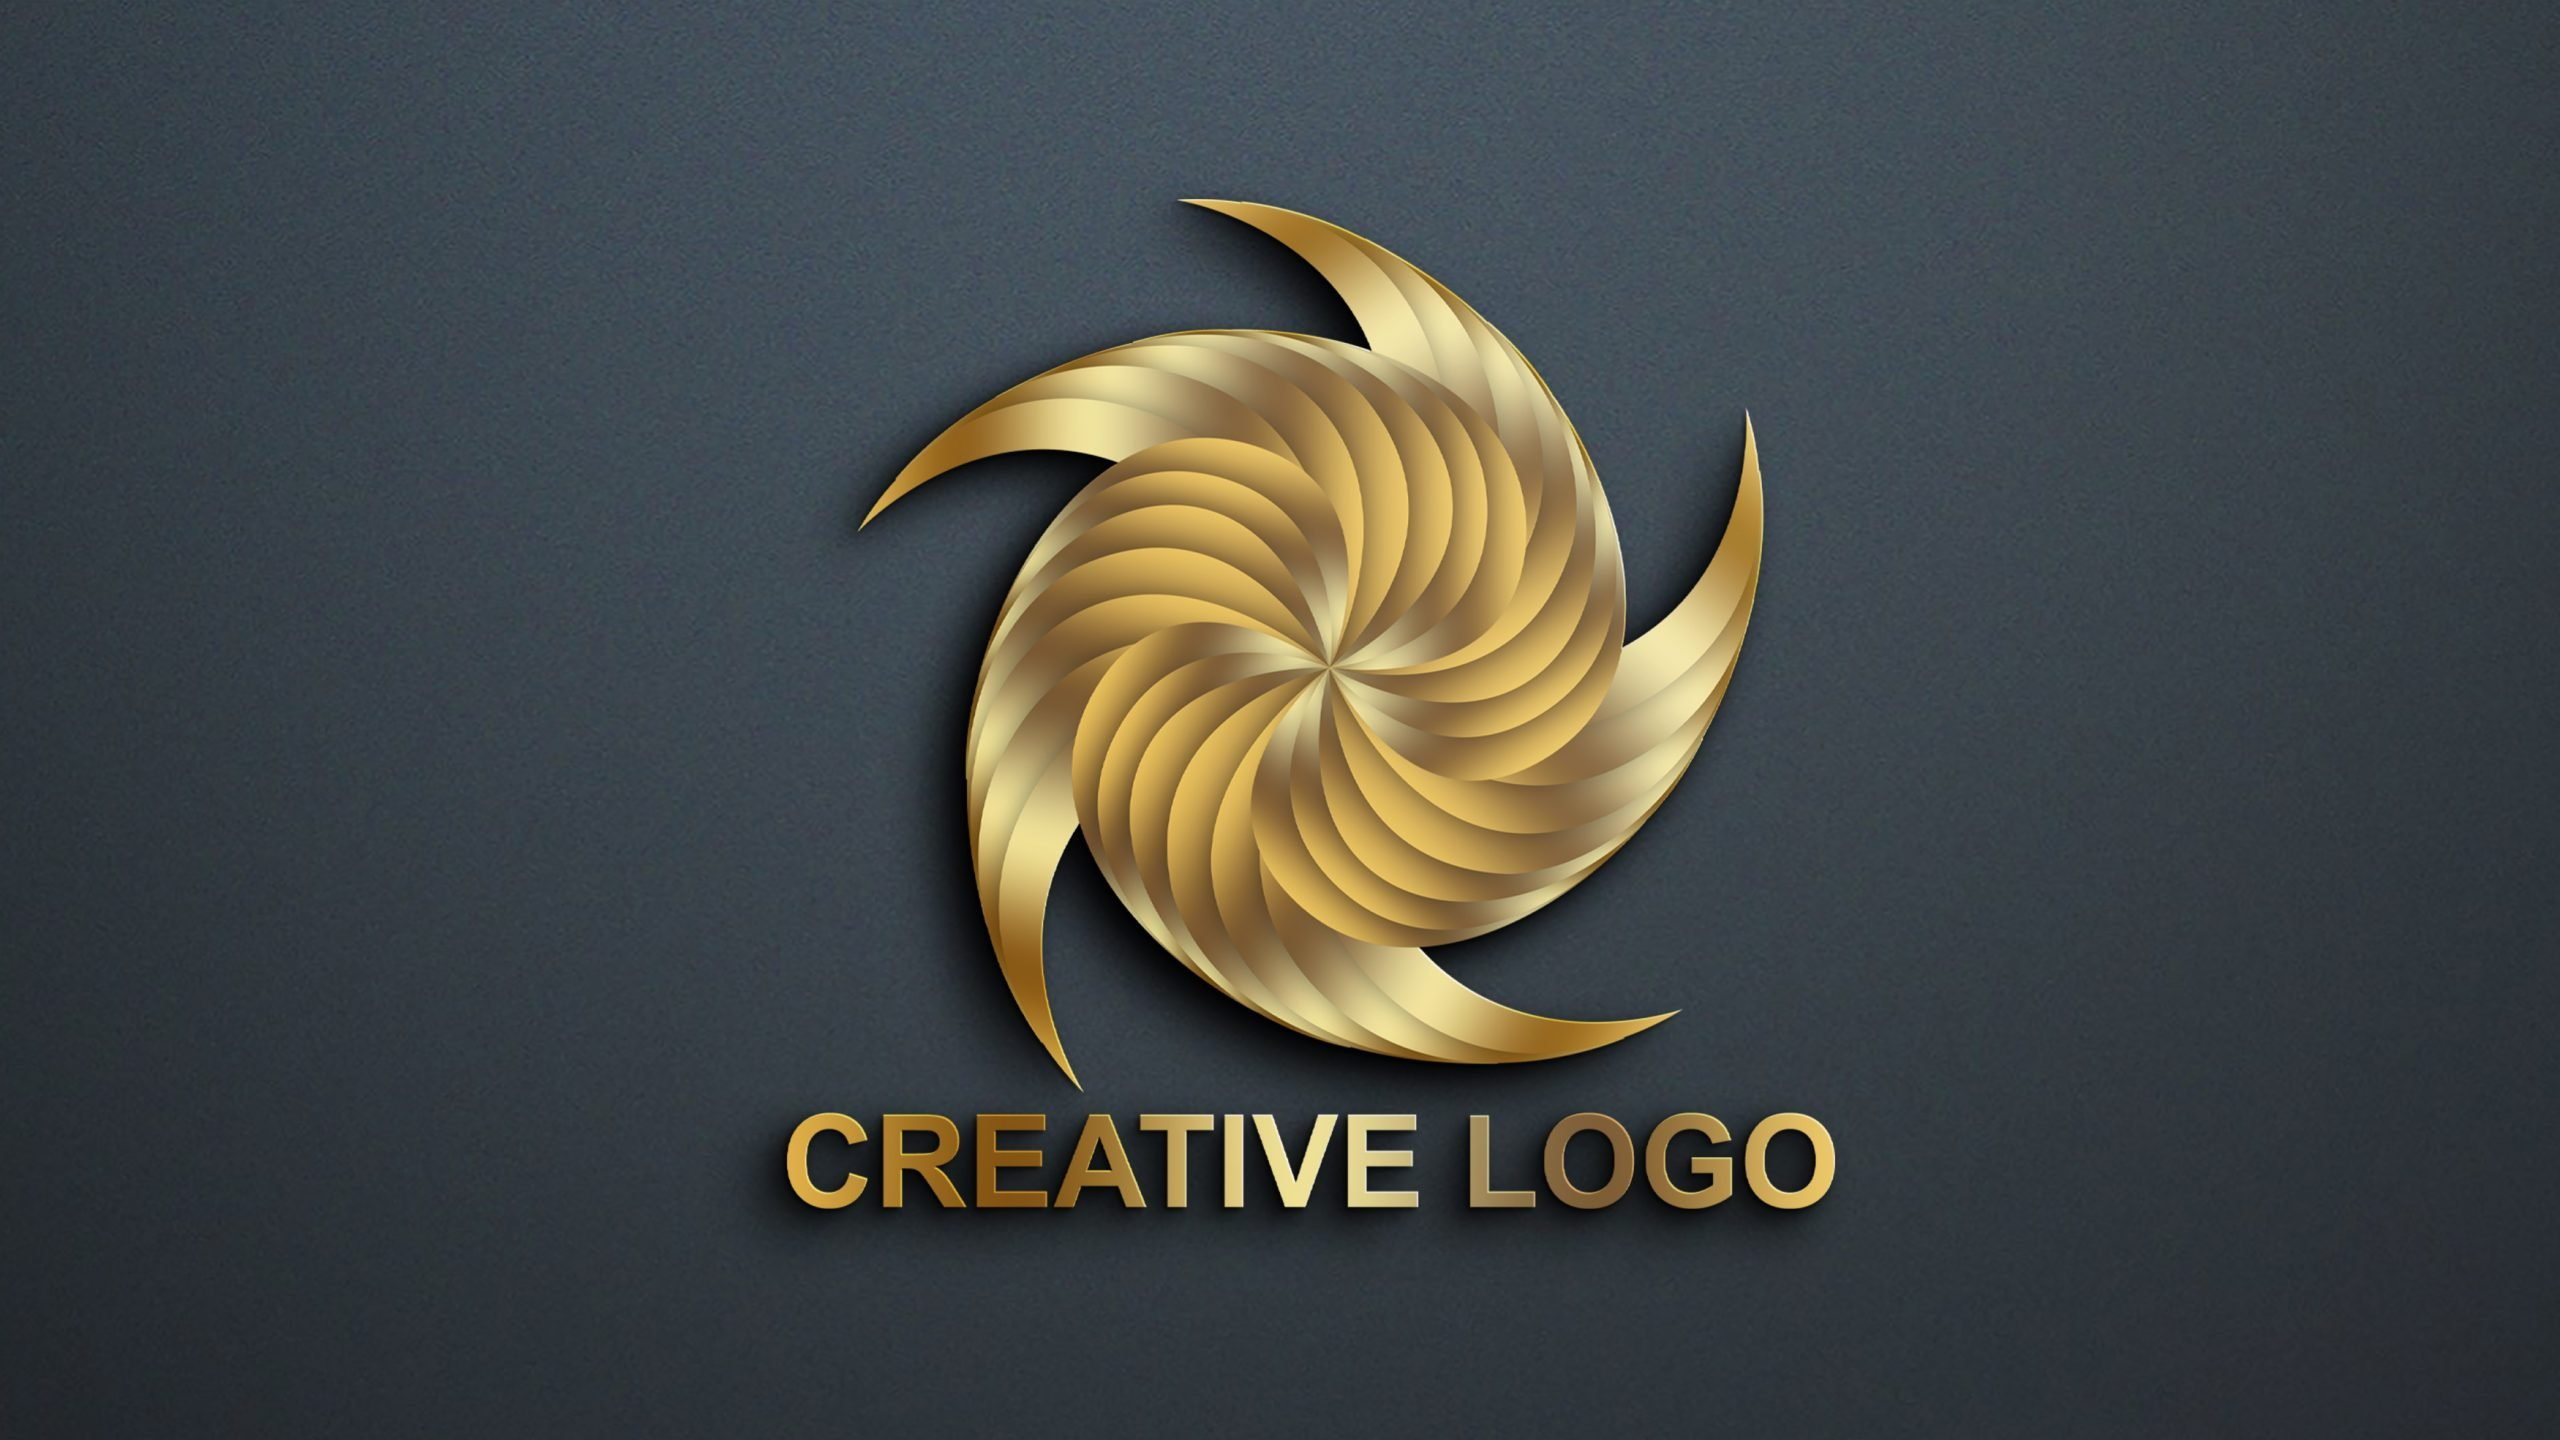 Free Creative Abstract Logo Design Template